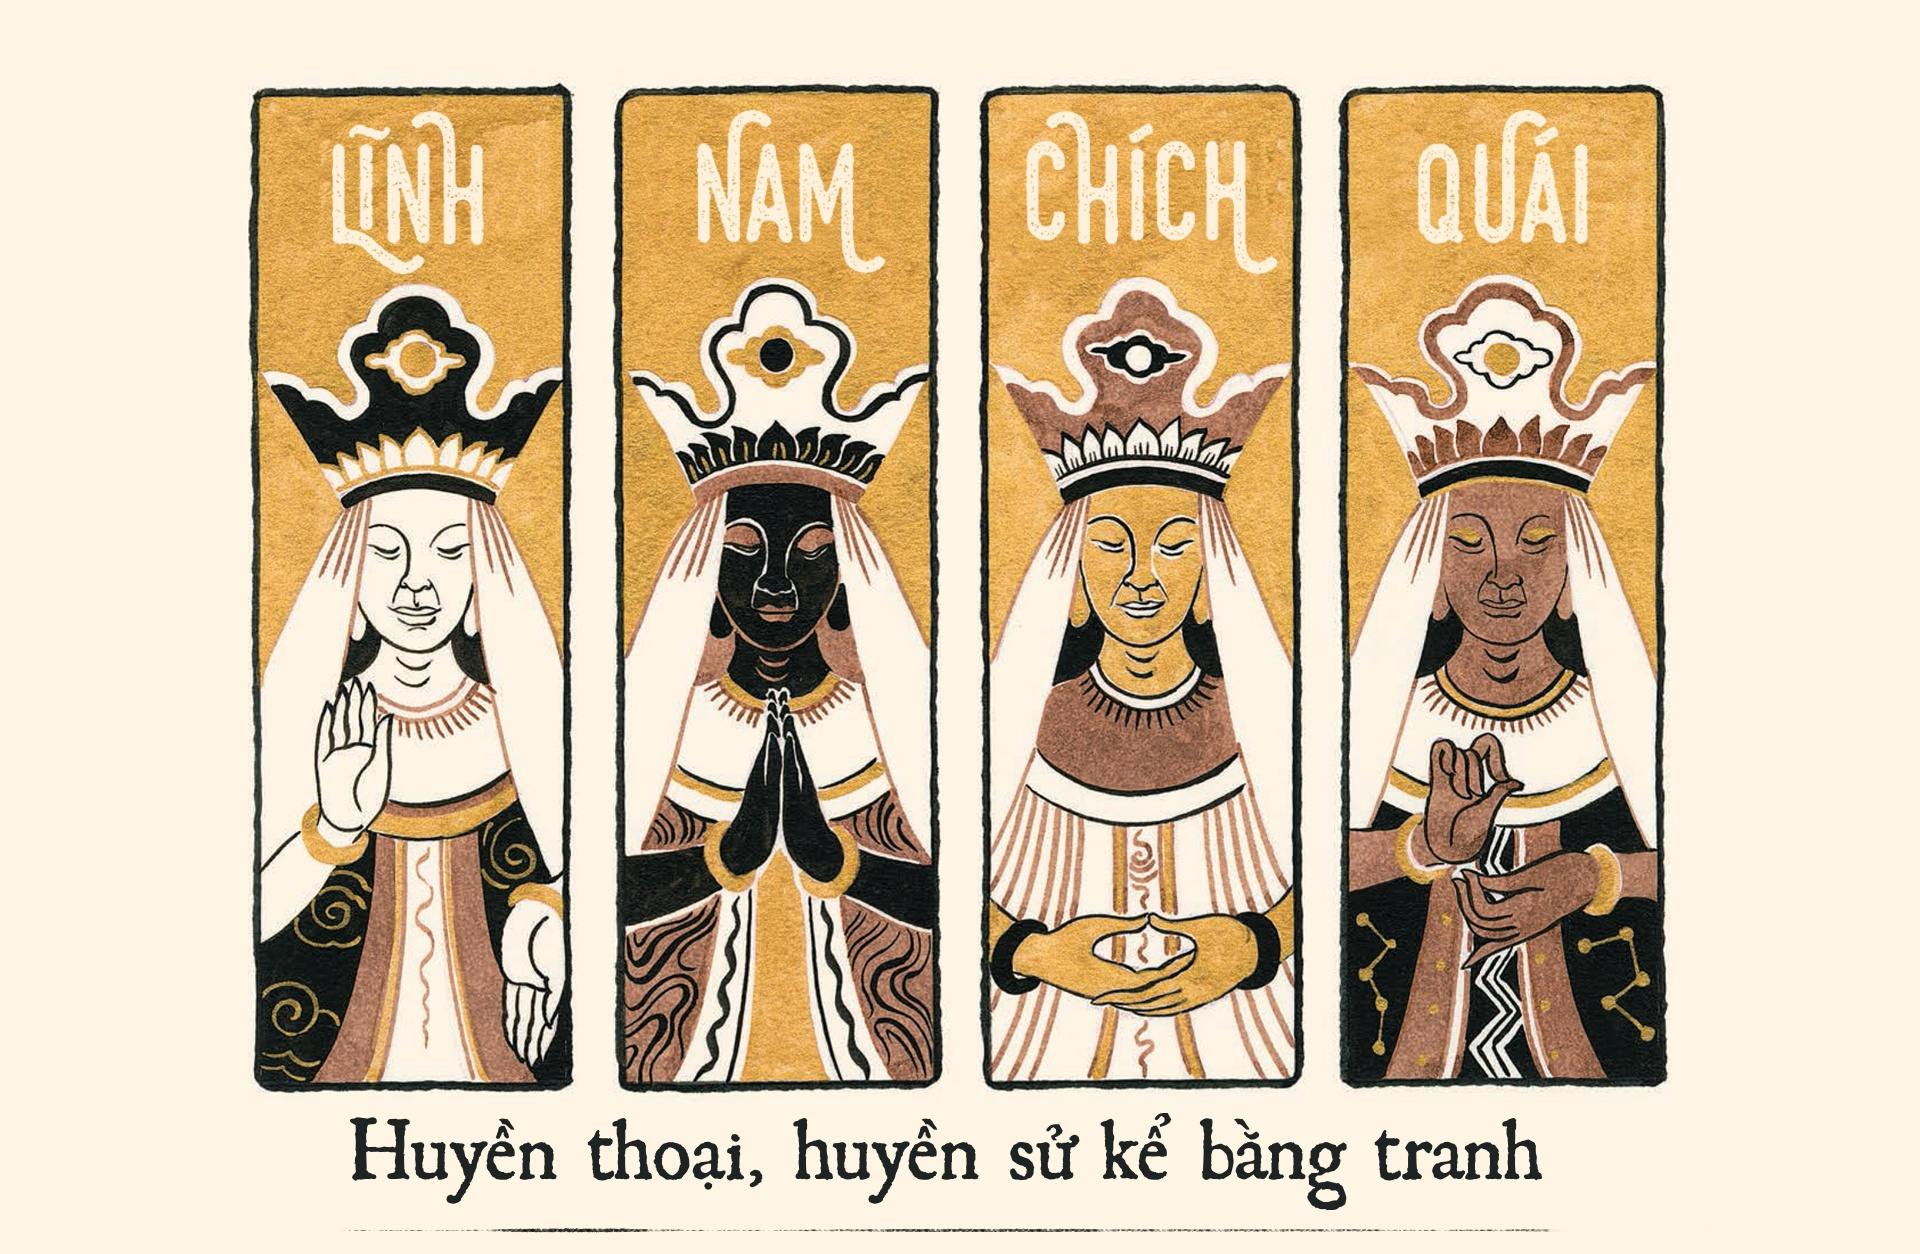 Linh Nam chich quai,  Ta Huy Long,  Art Book anh 2